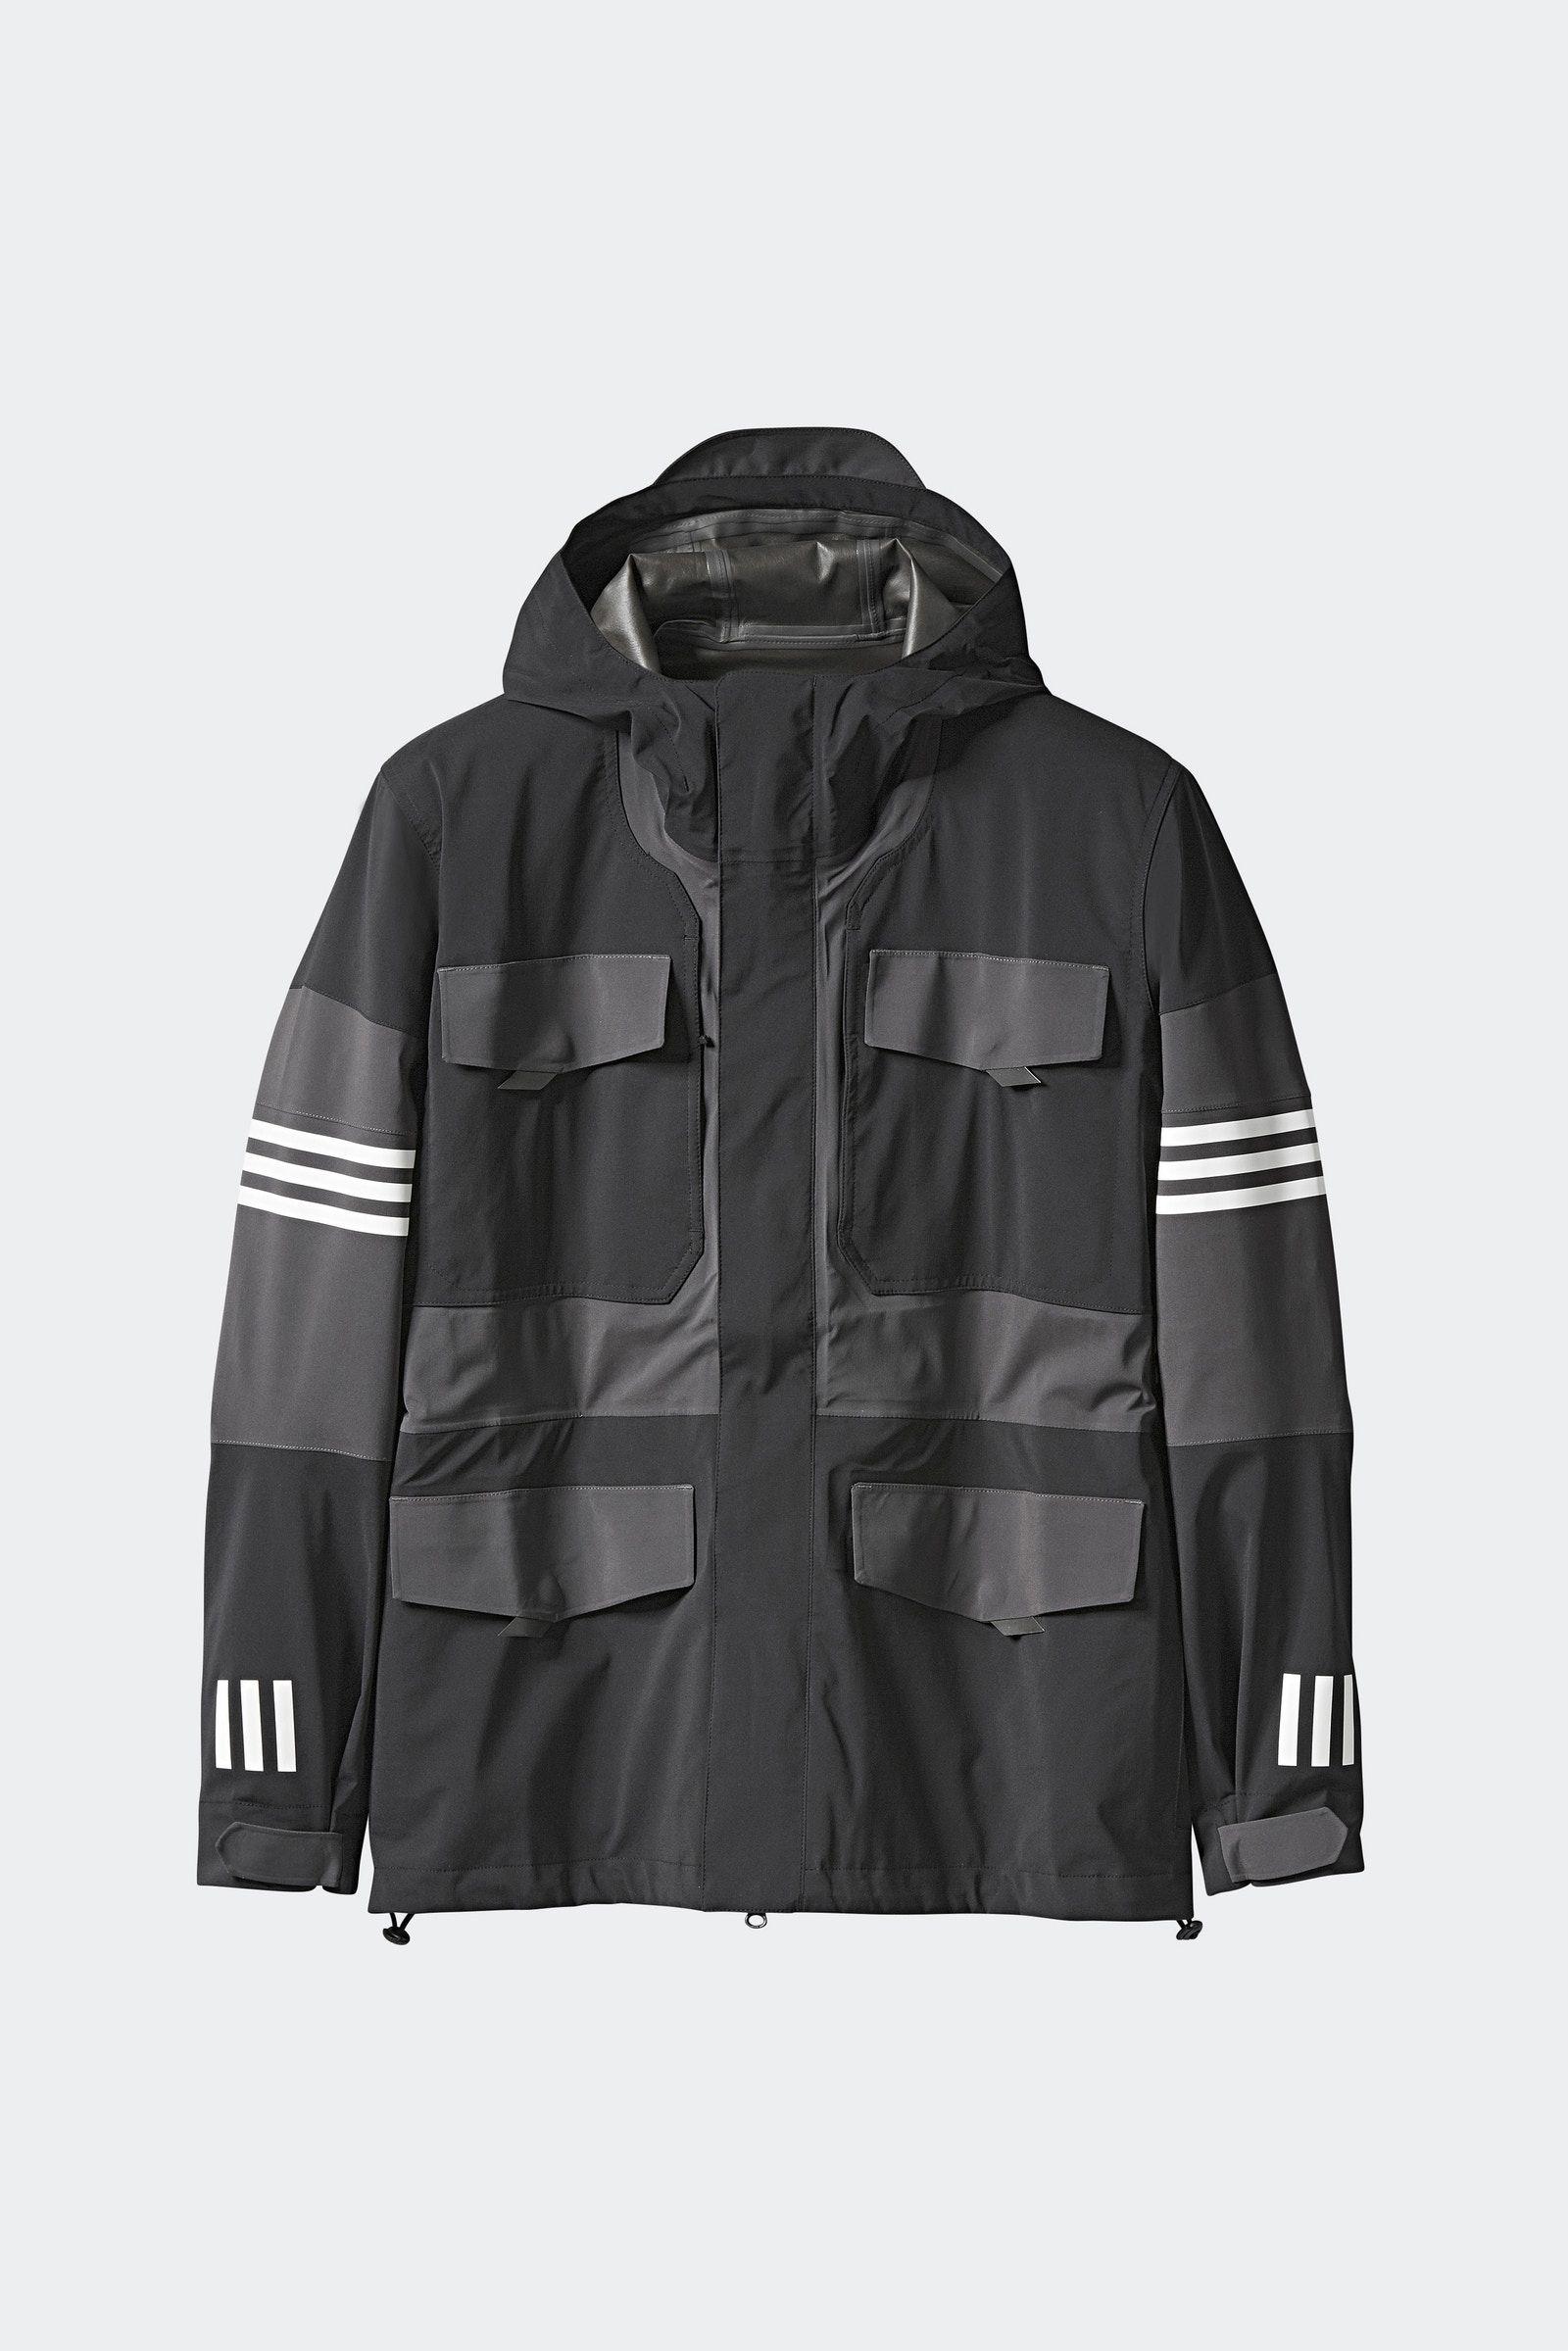 Mikkar Hoodie Quotes Knitwear Pullover Raincoat Jacket Pins